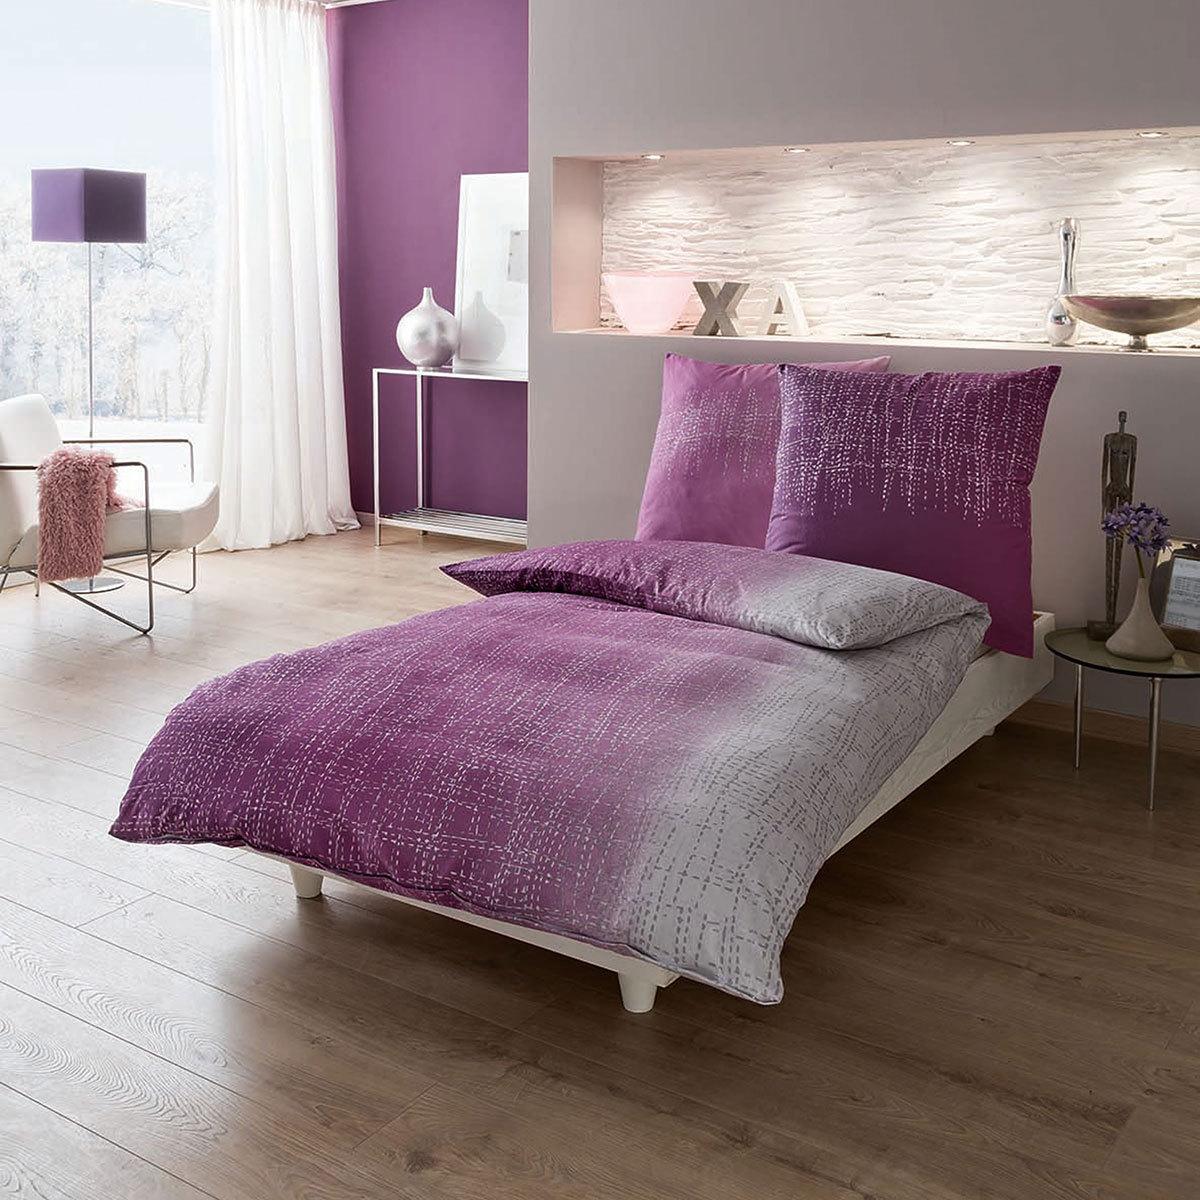 kaeppel biber bettw sche tonight violett g nstig online kaufen bei bettwaren shop. Black Bedroom Furniture Sets. Home Design Ideas